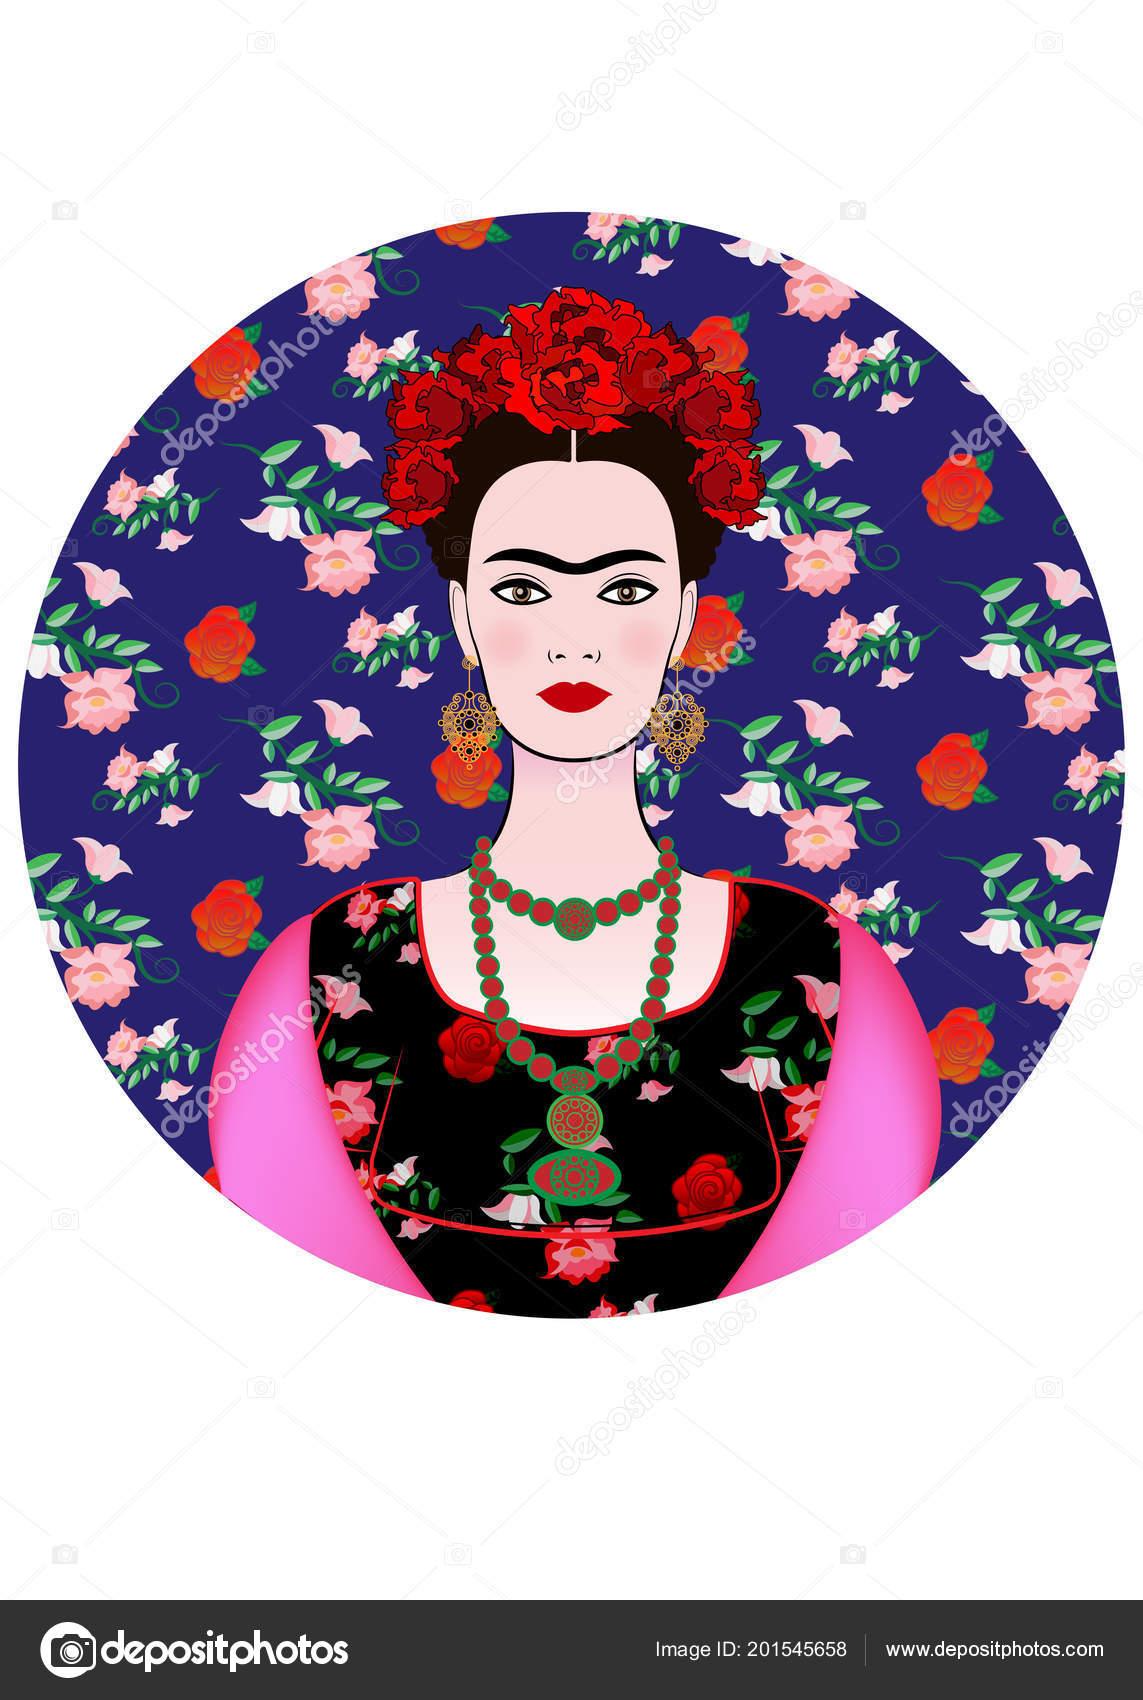 199a8faaf2 Retrato Vector Frida Kahlo Mujer Mexicana Hermosa Joven Con Peinado ...